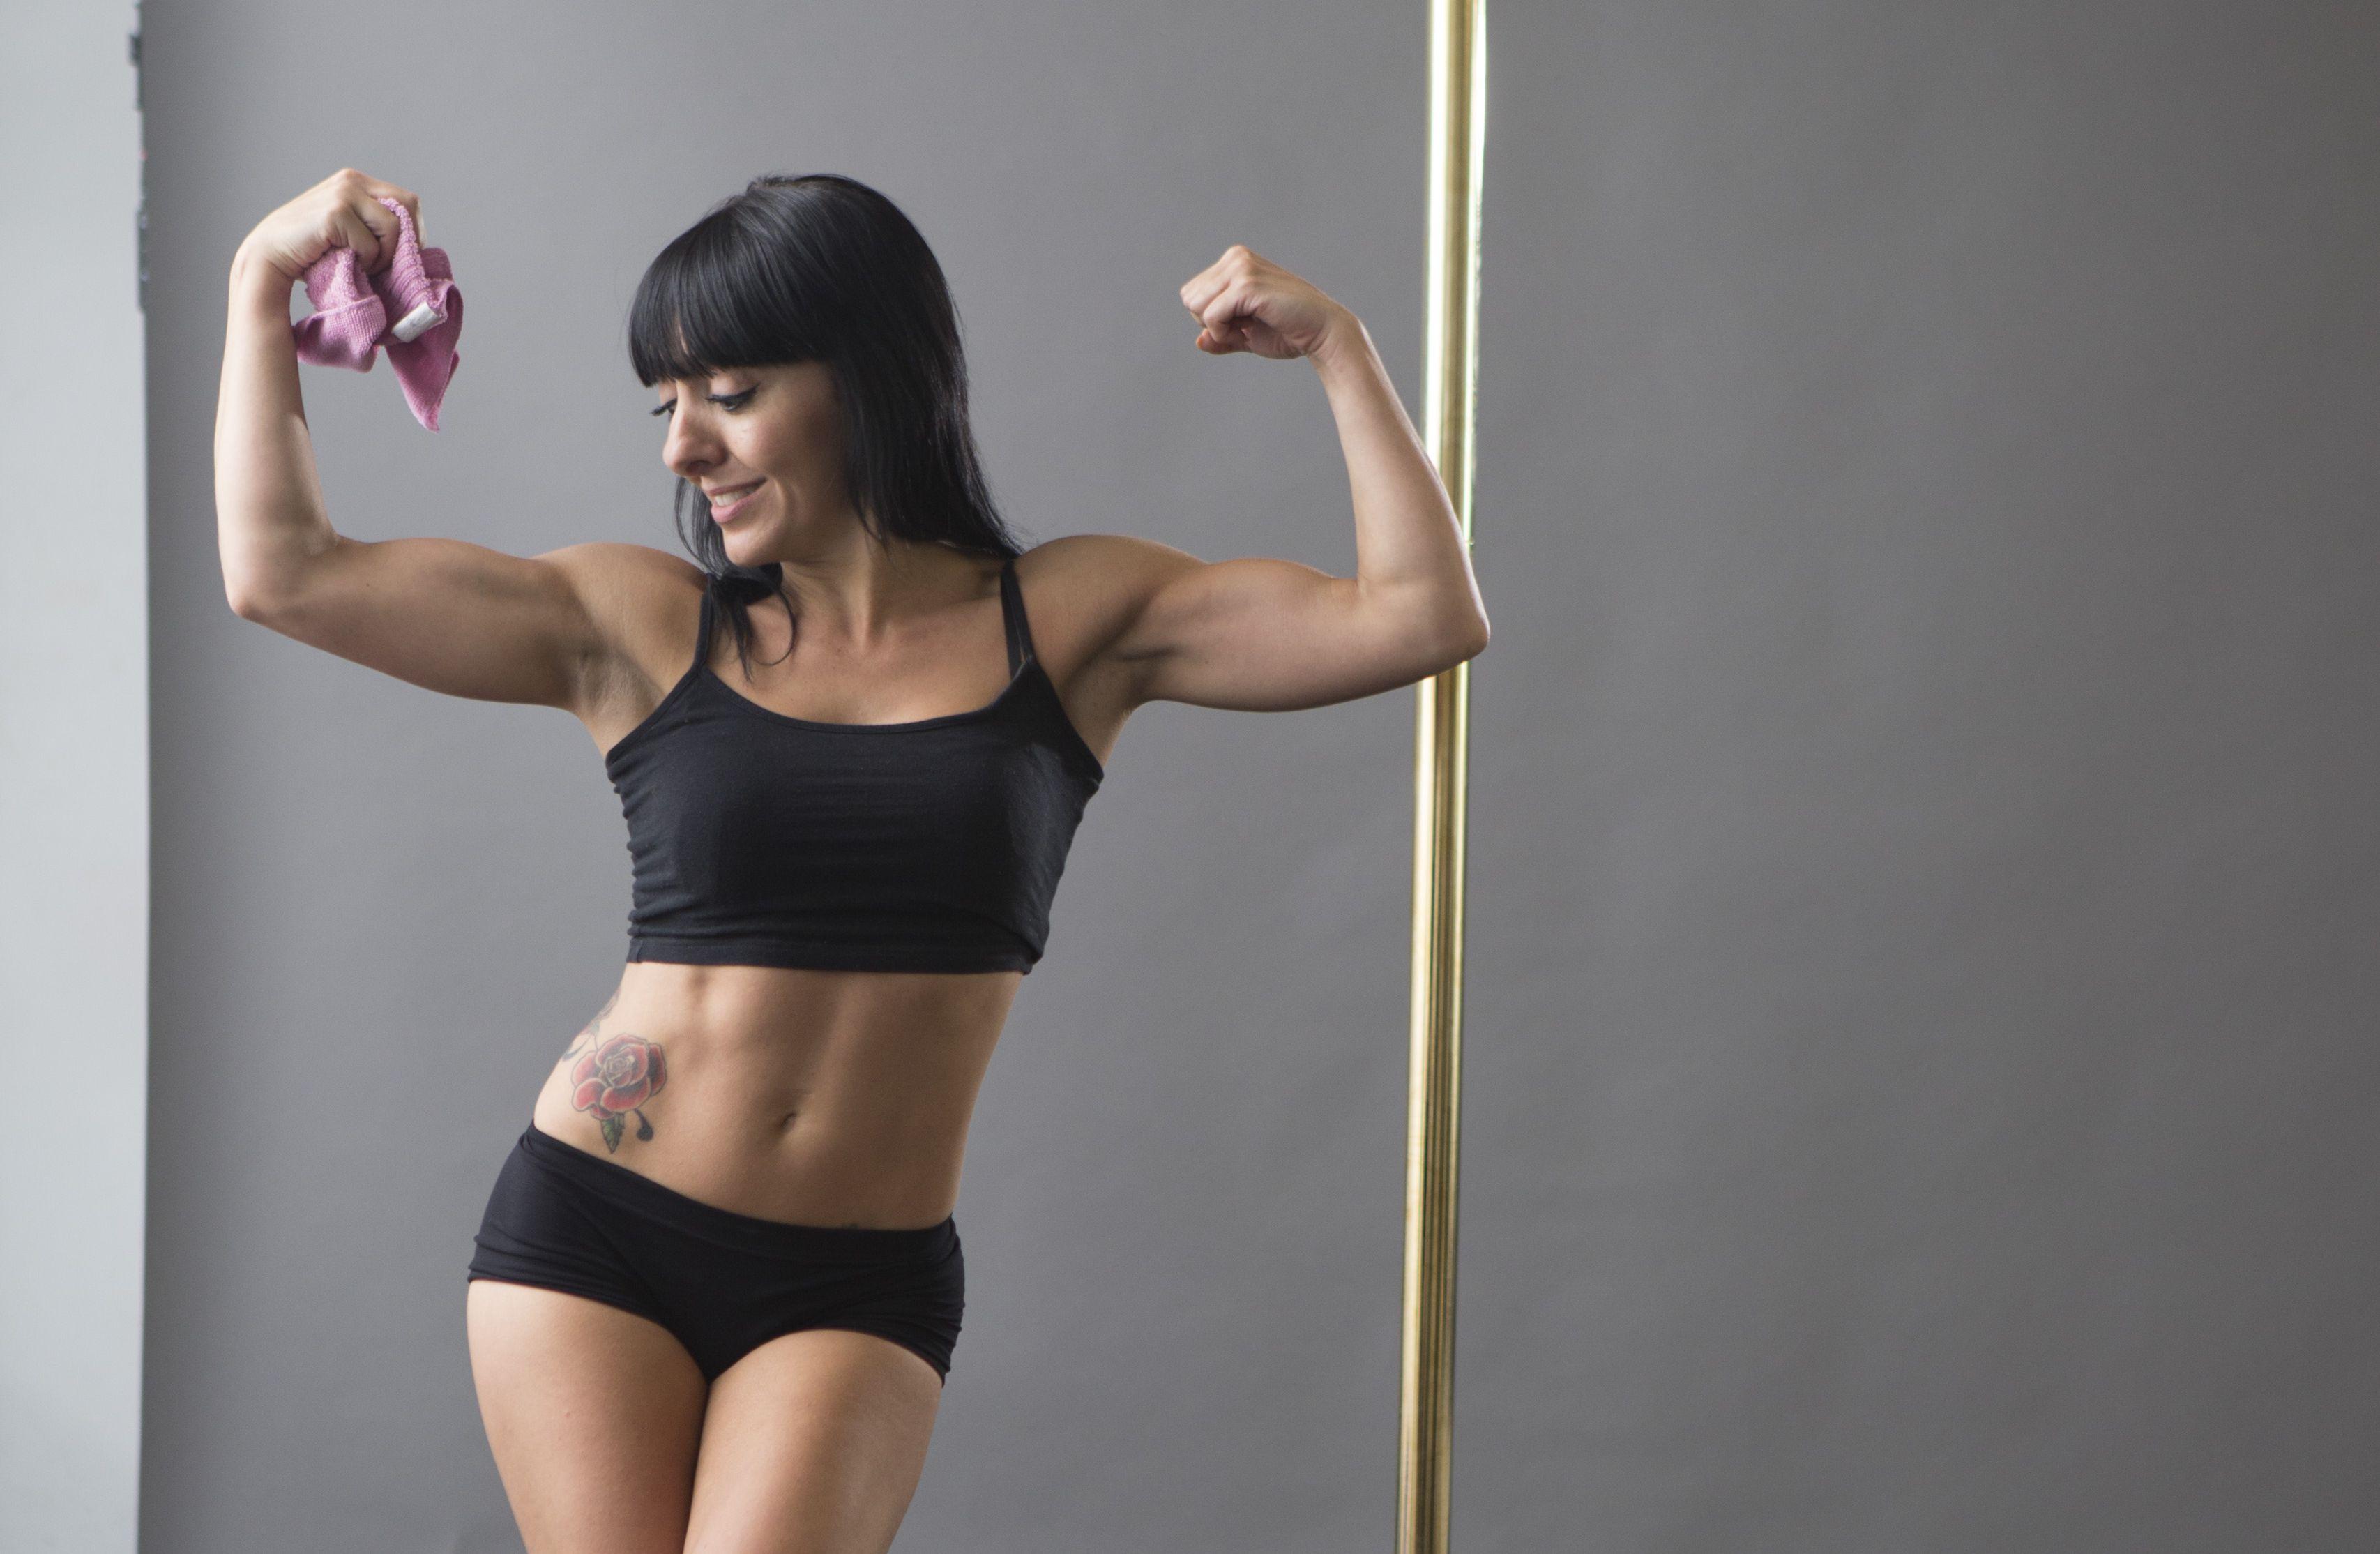 Stripper fitness classes